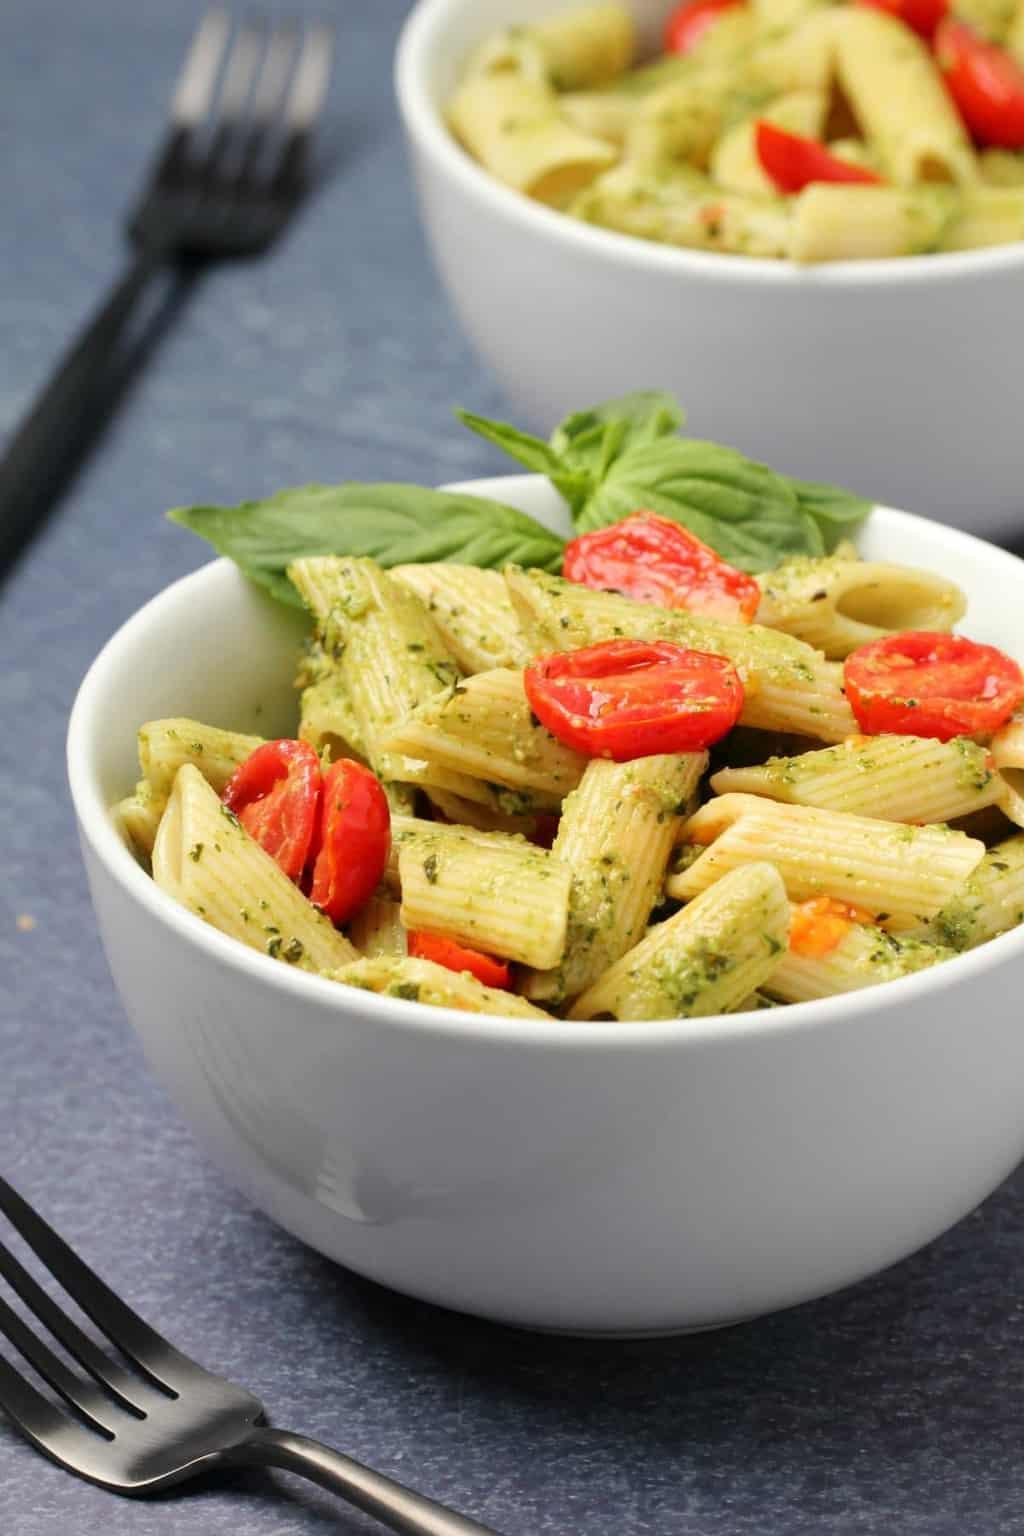 Vegan pesto pasta in a white bowl.